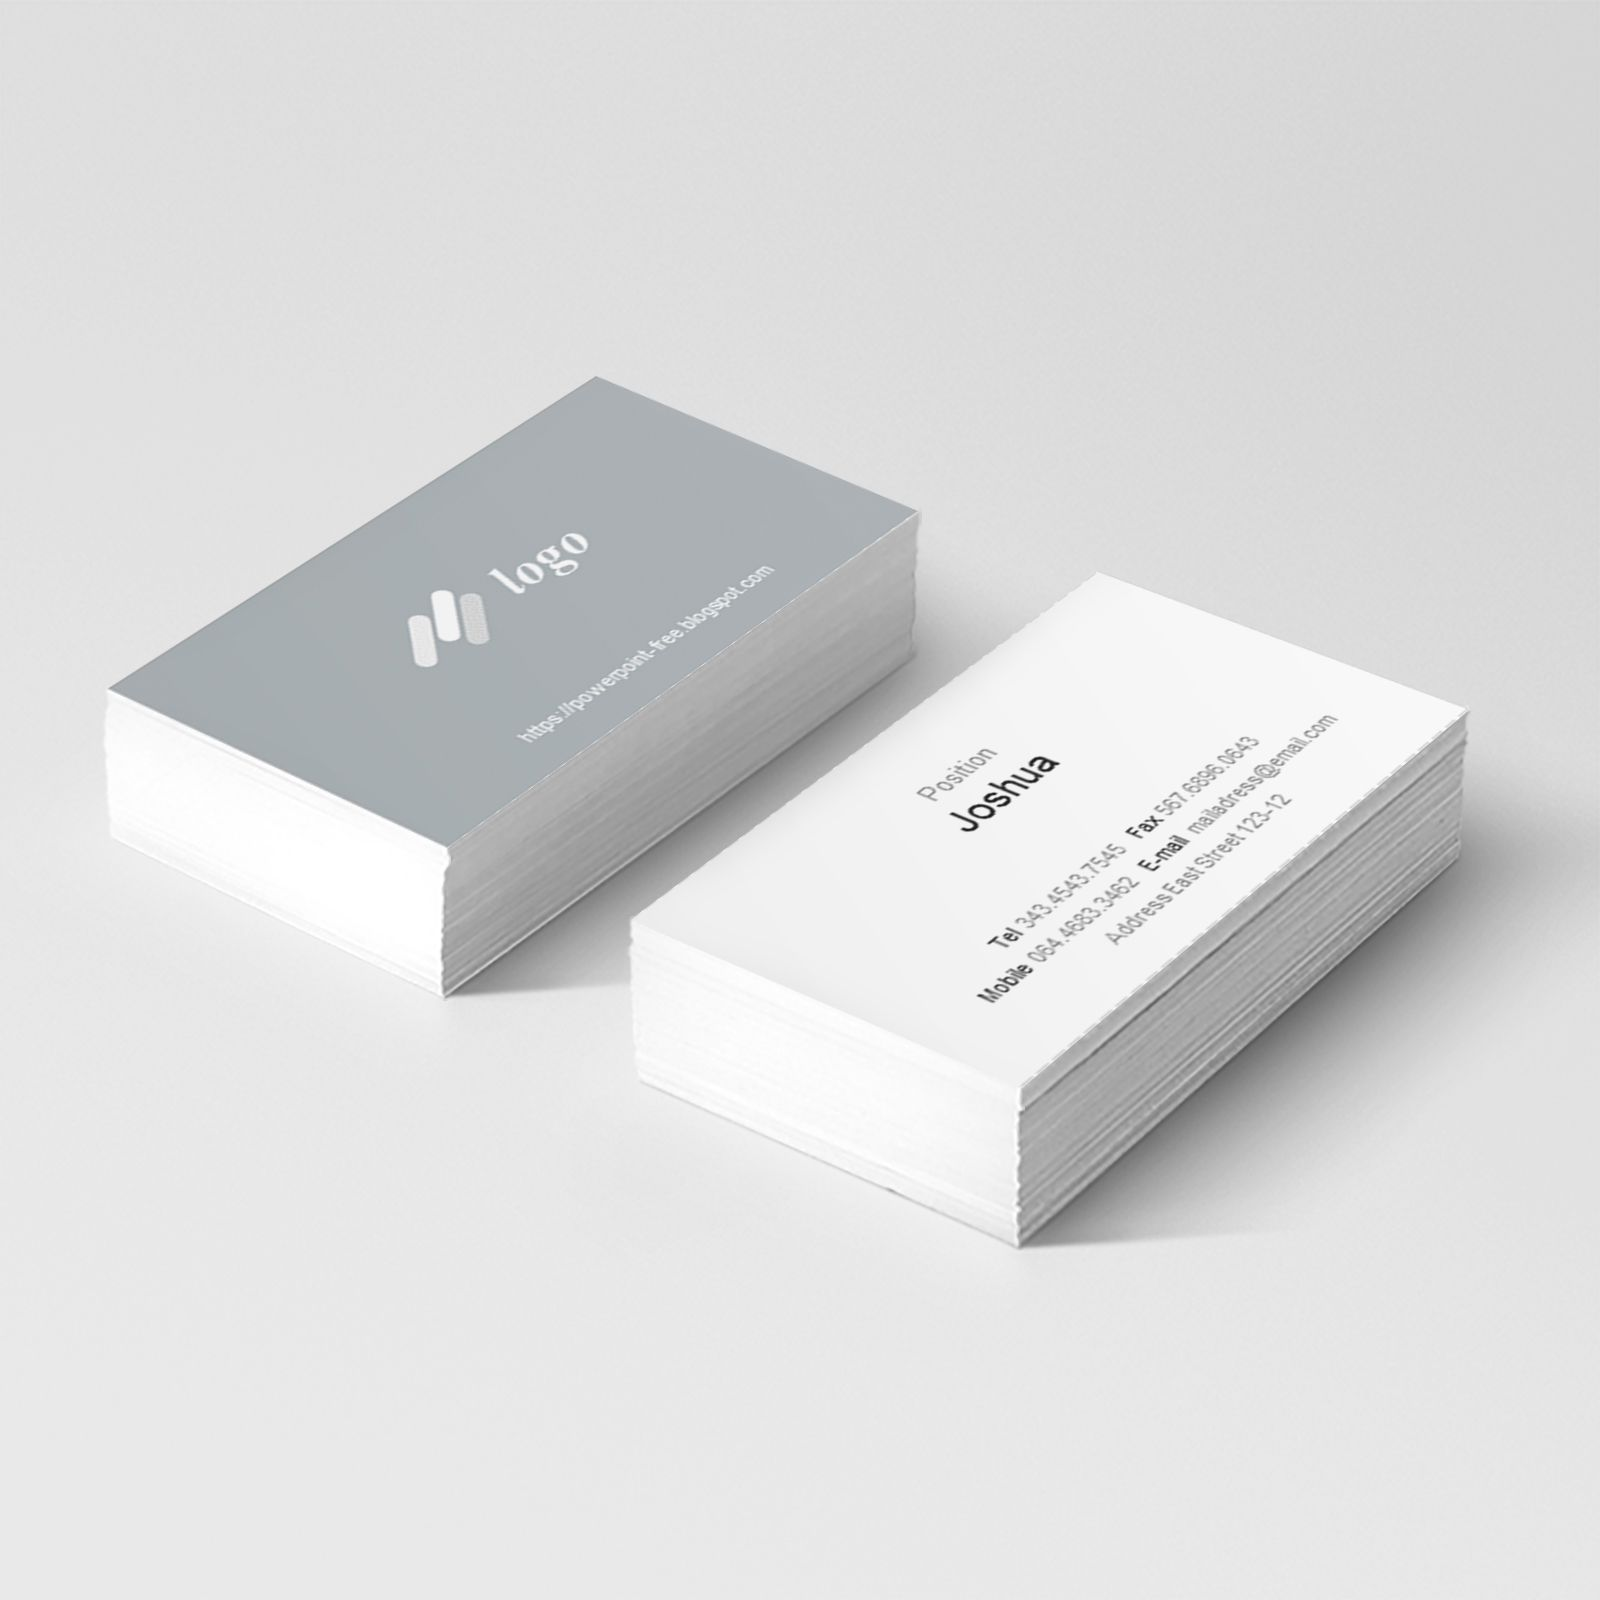 Basic Business Card Powerpoint Templates Powerpoint Free In Business Card Template Powerpoint Powerpoint Template Free Powerpoint Free Business Card Template